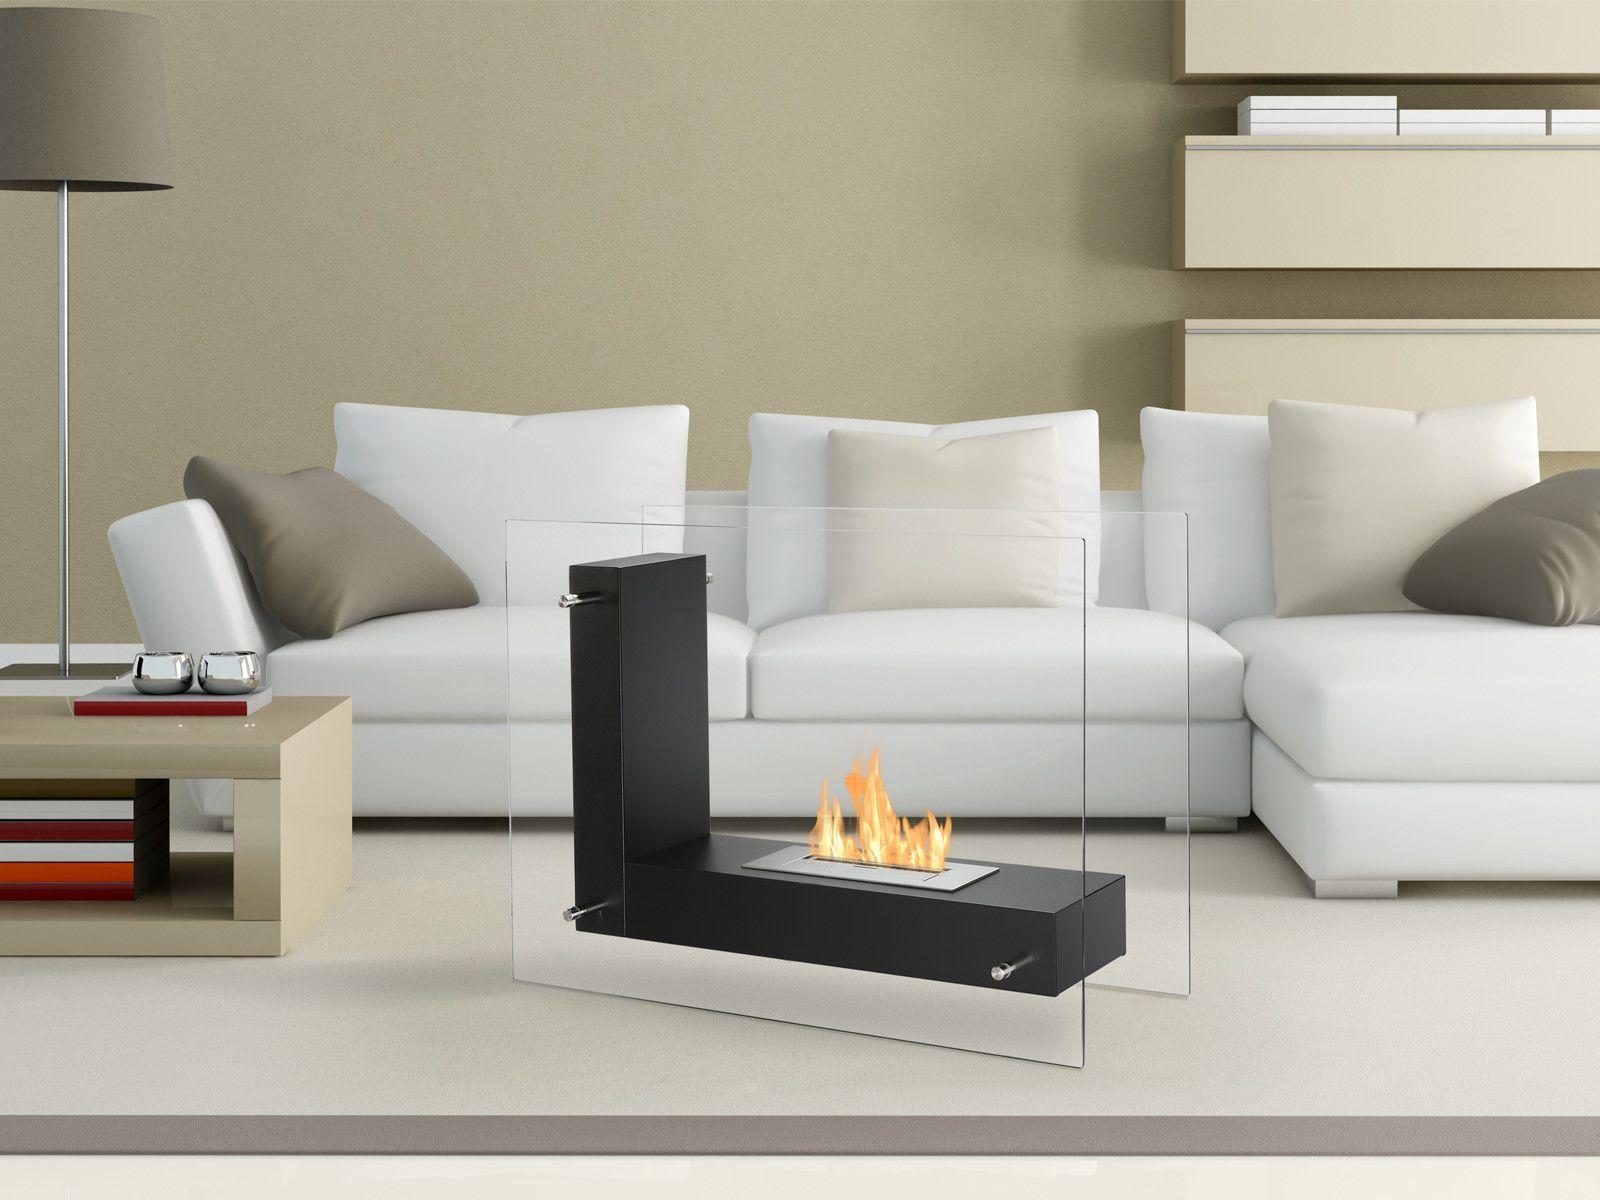 Ignis Vitrum L Black 32 Free Standing Ethanol Fireplace In